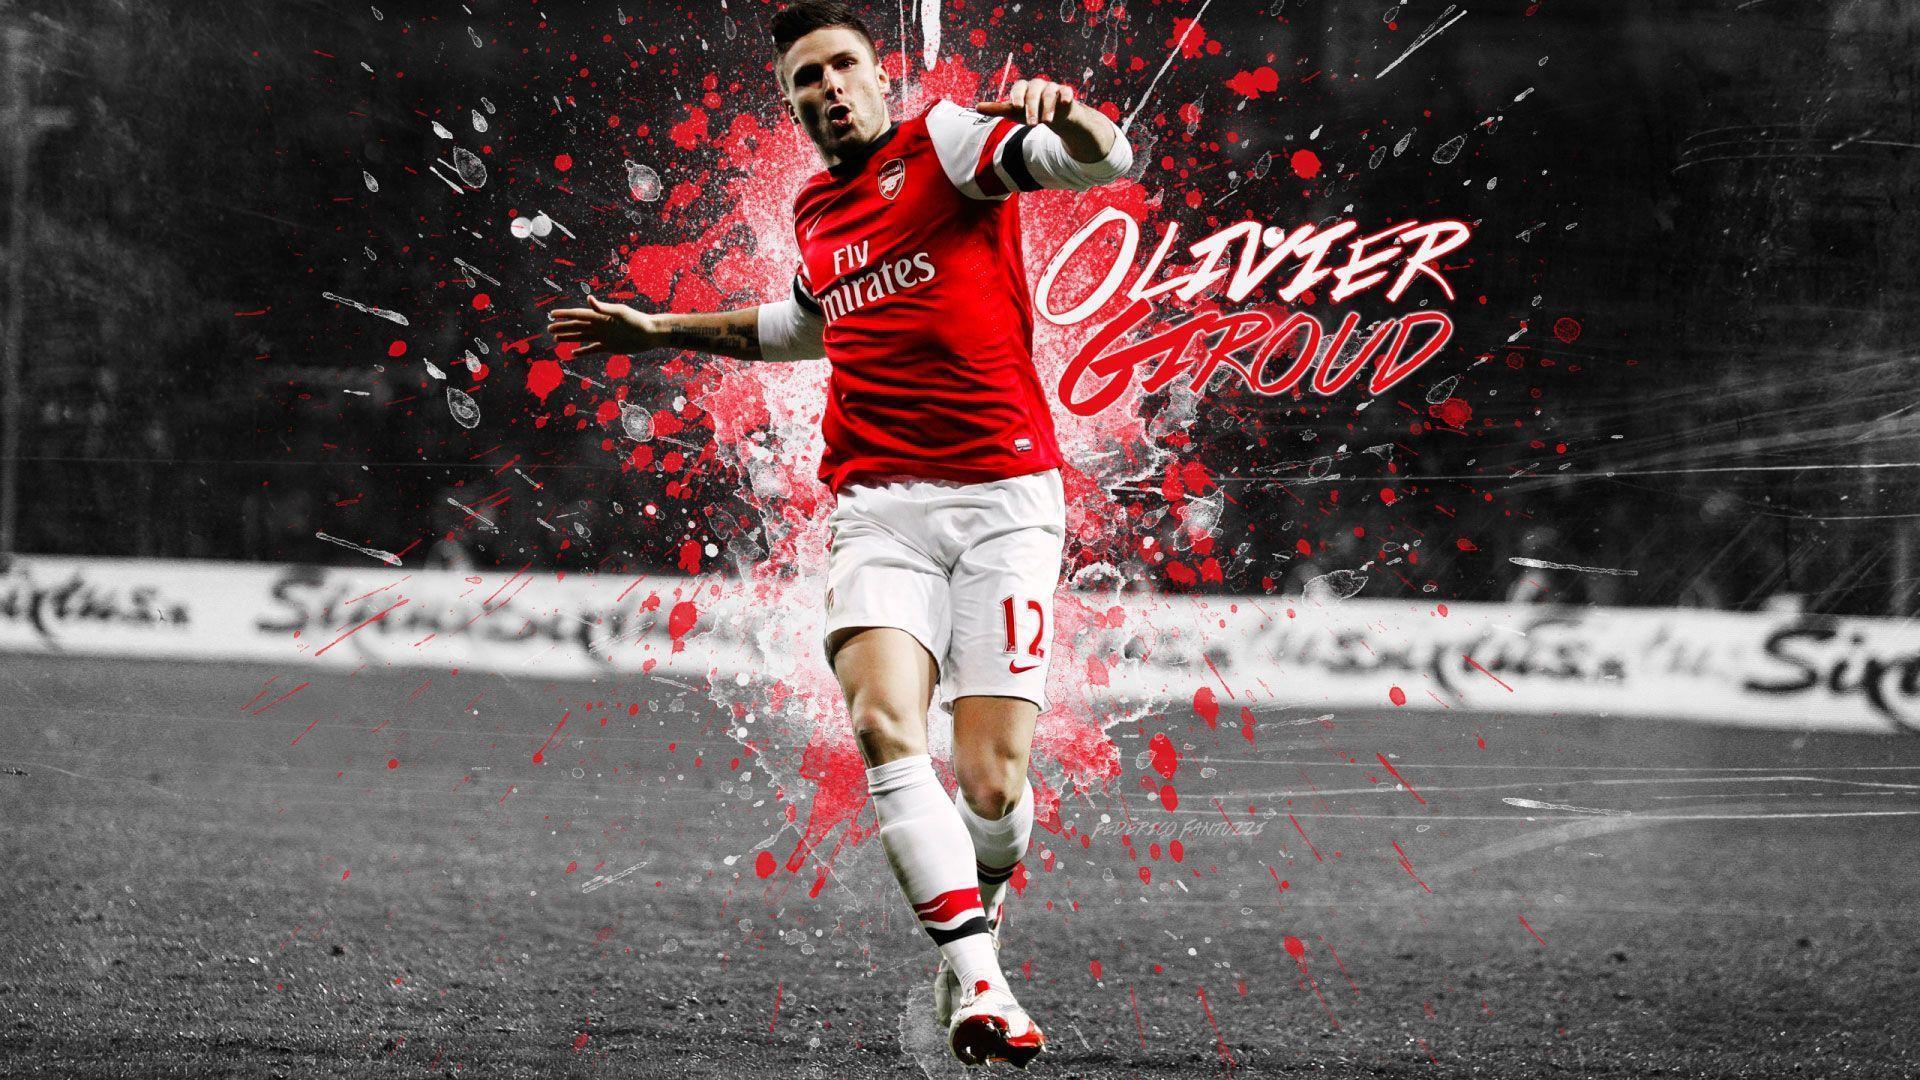 Arsenal Wallpapers 2016